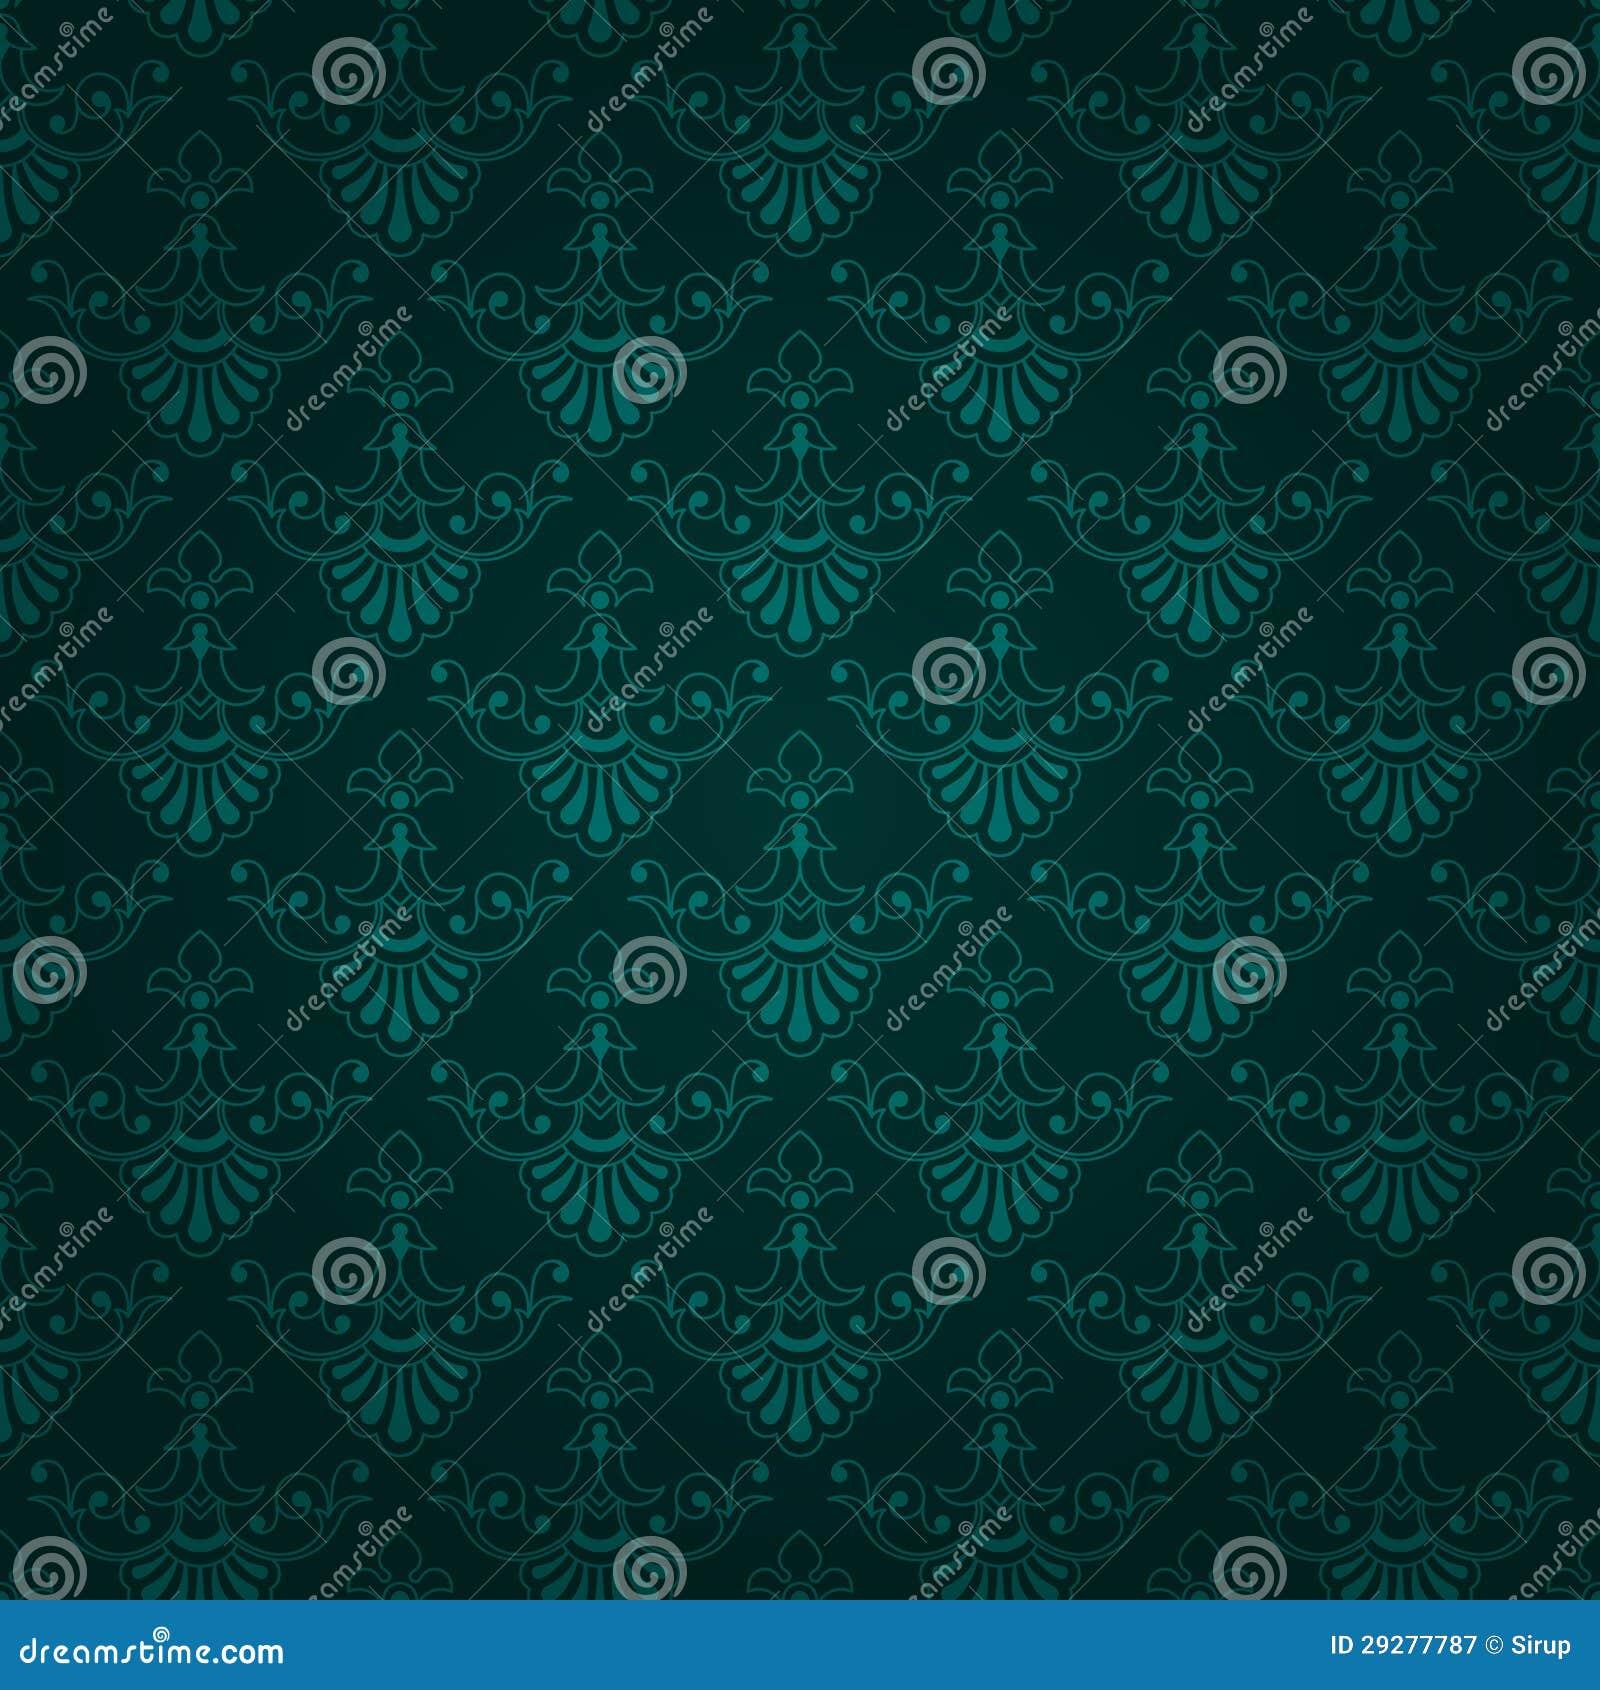 Seamless dark green vintage wallpaper design stock vector - Green design ...